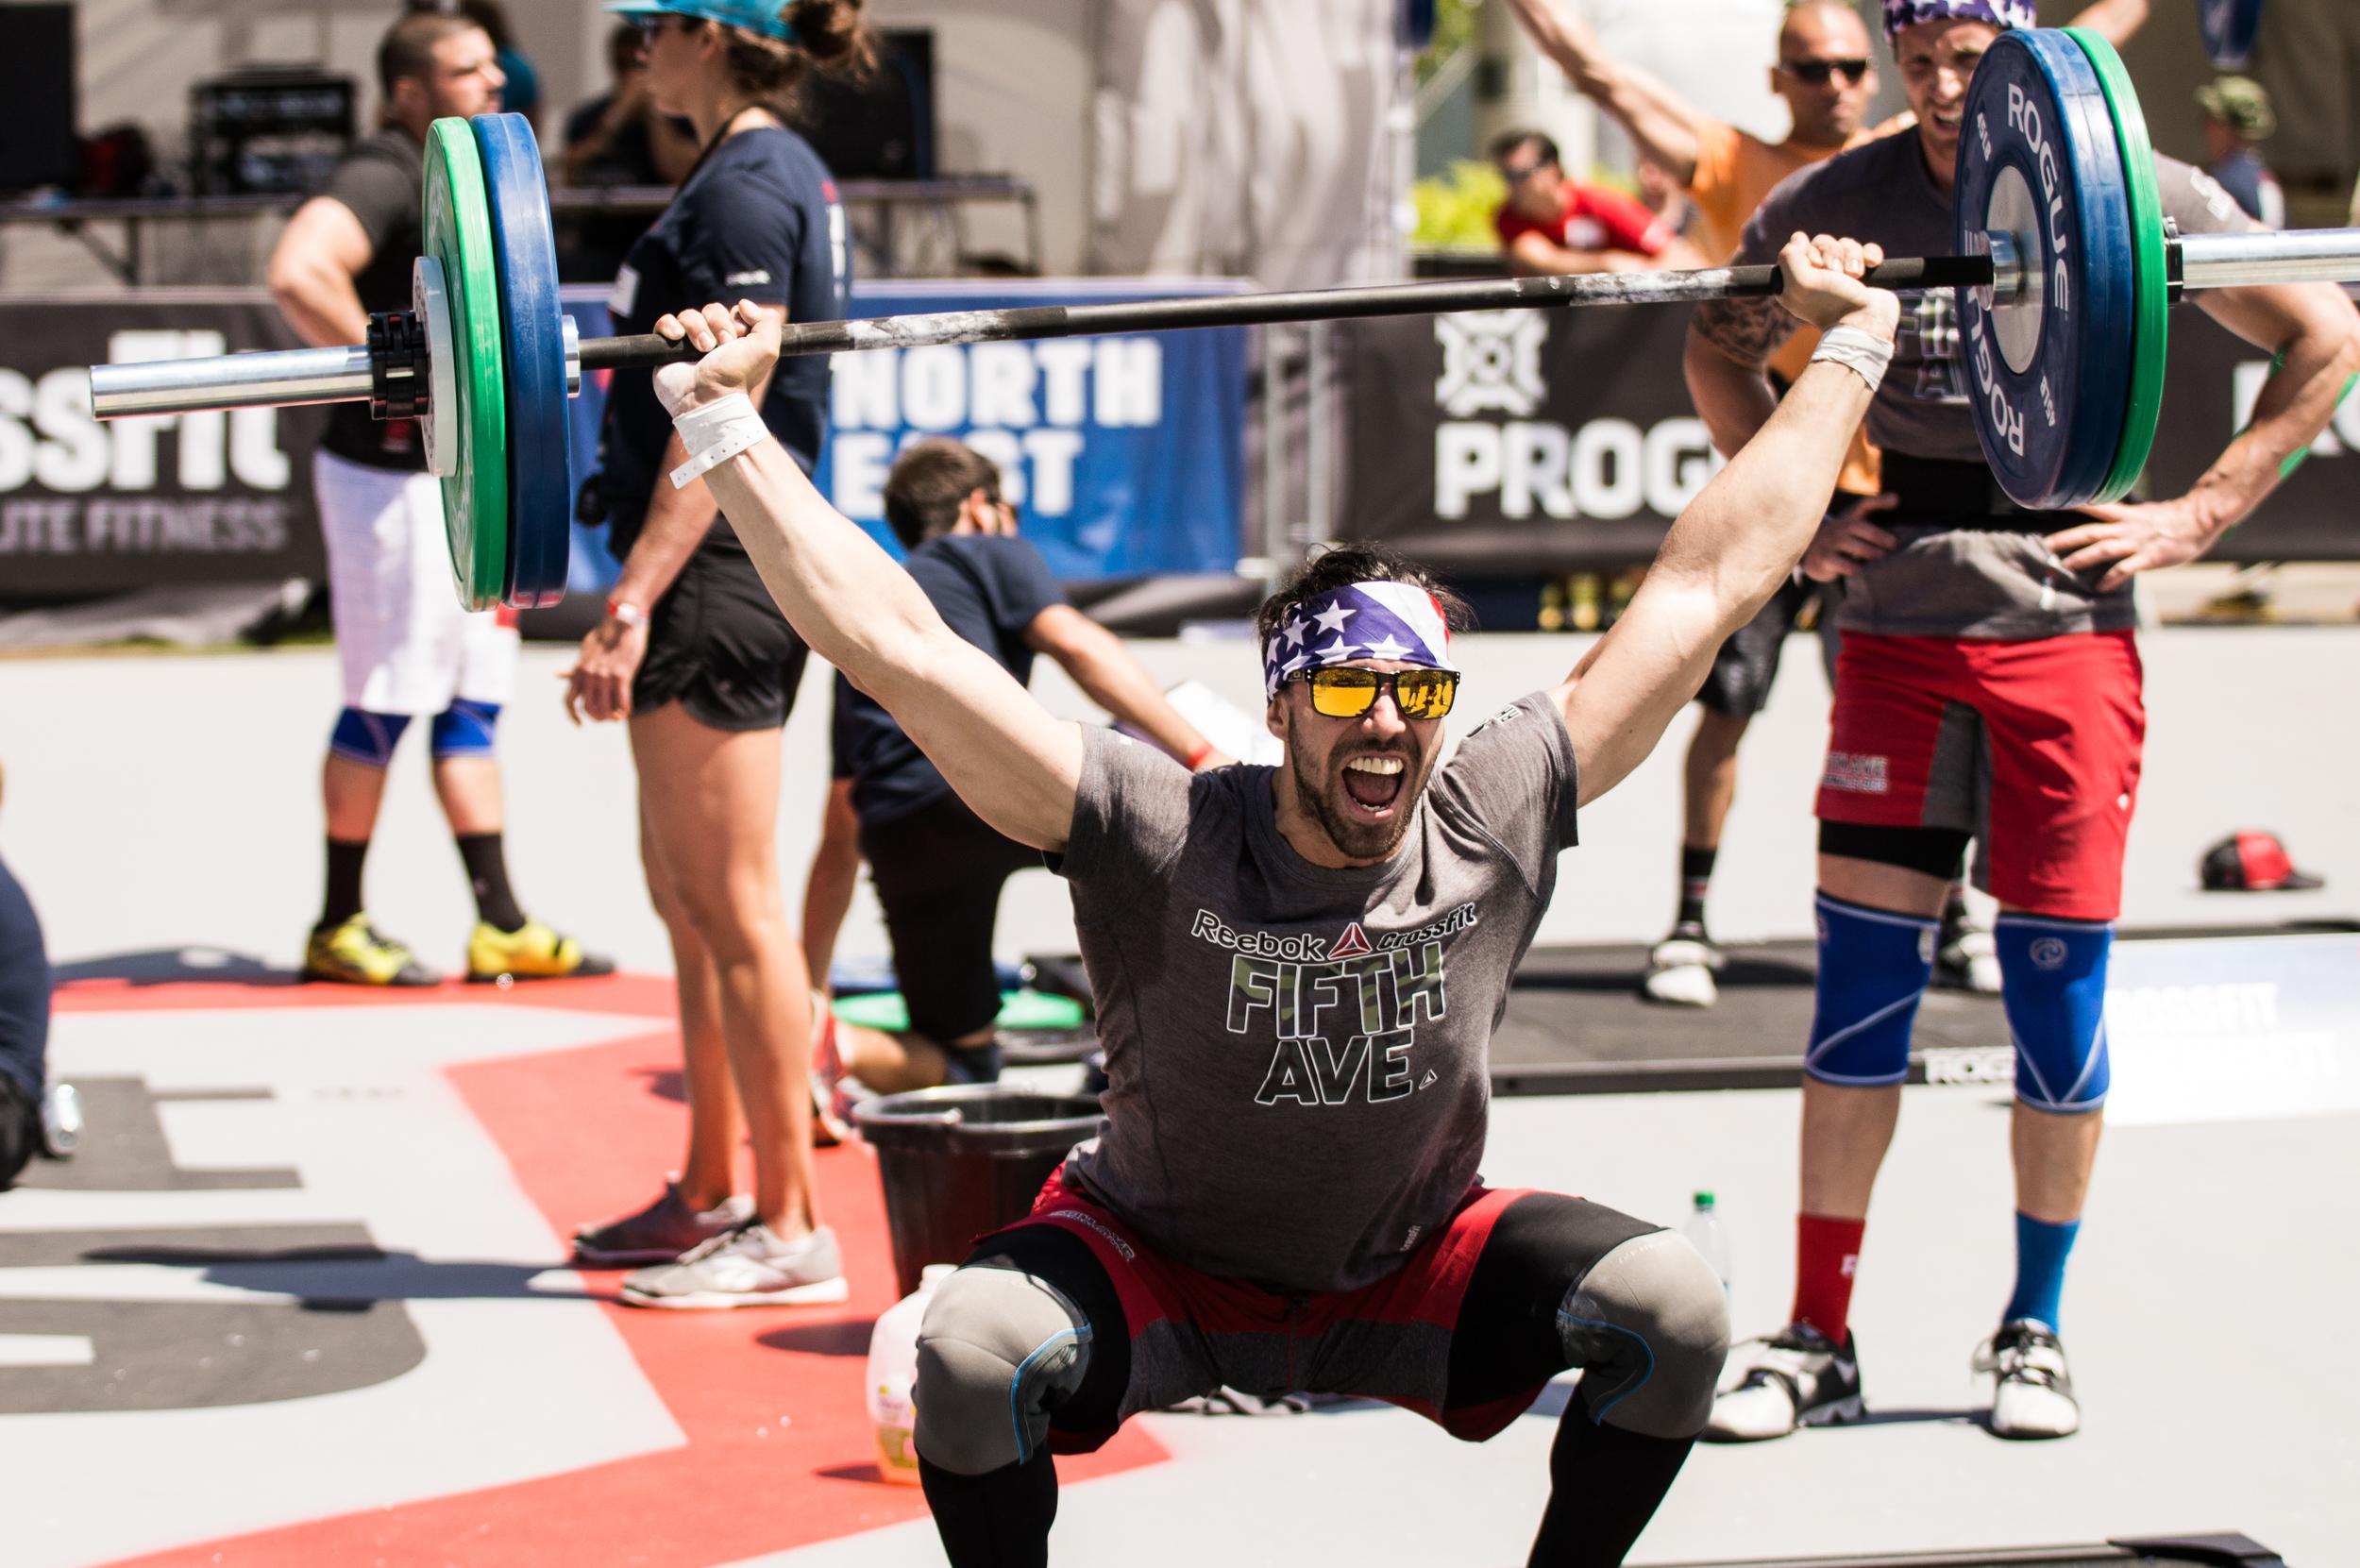 Reebok CrossFit 5th Avenue - NYC